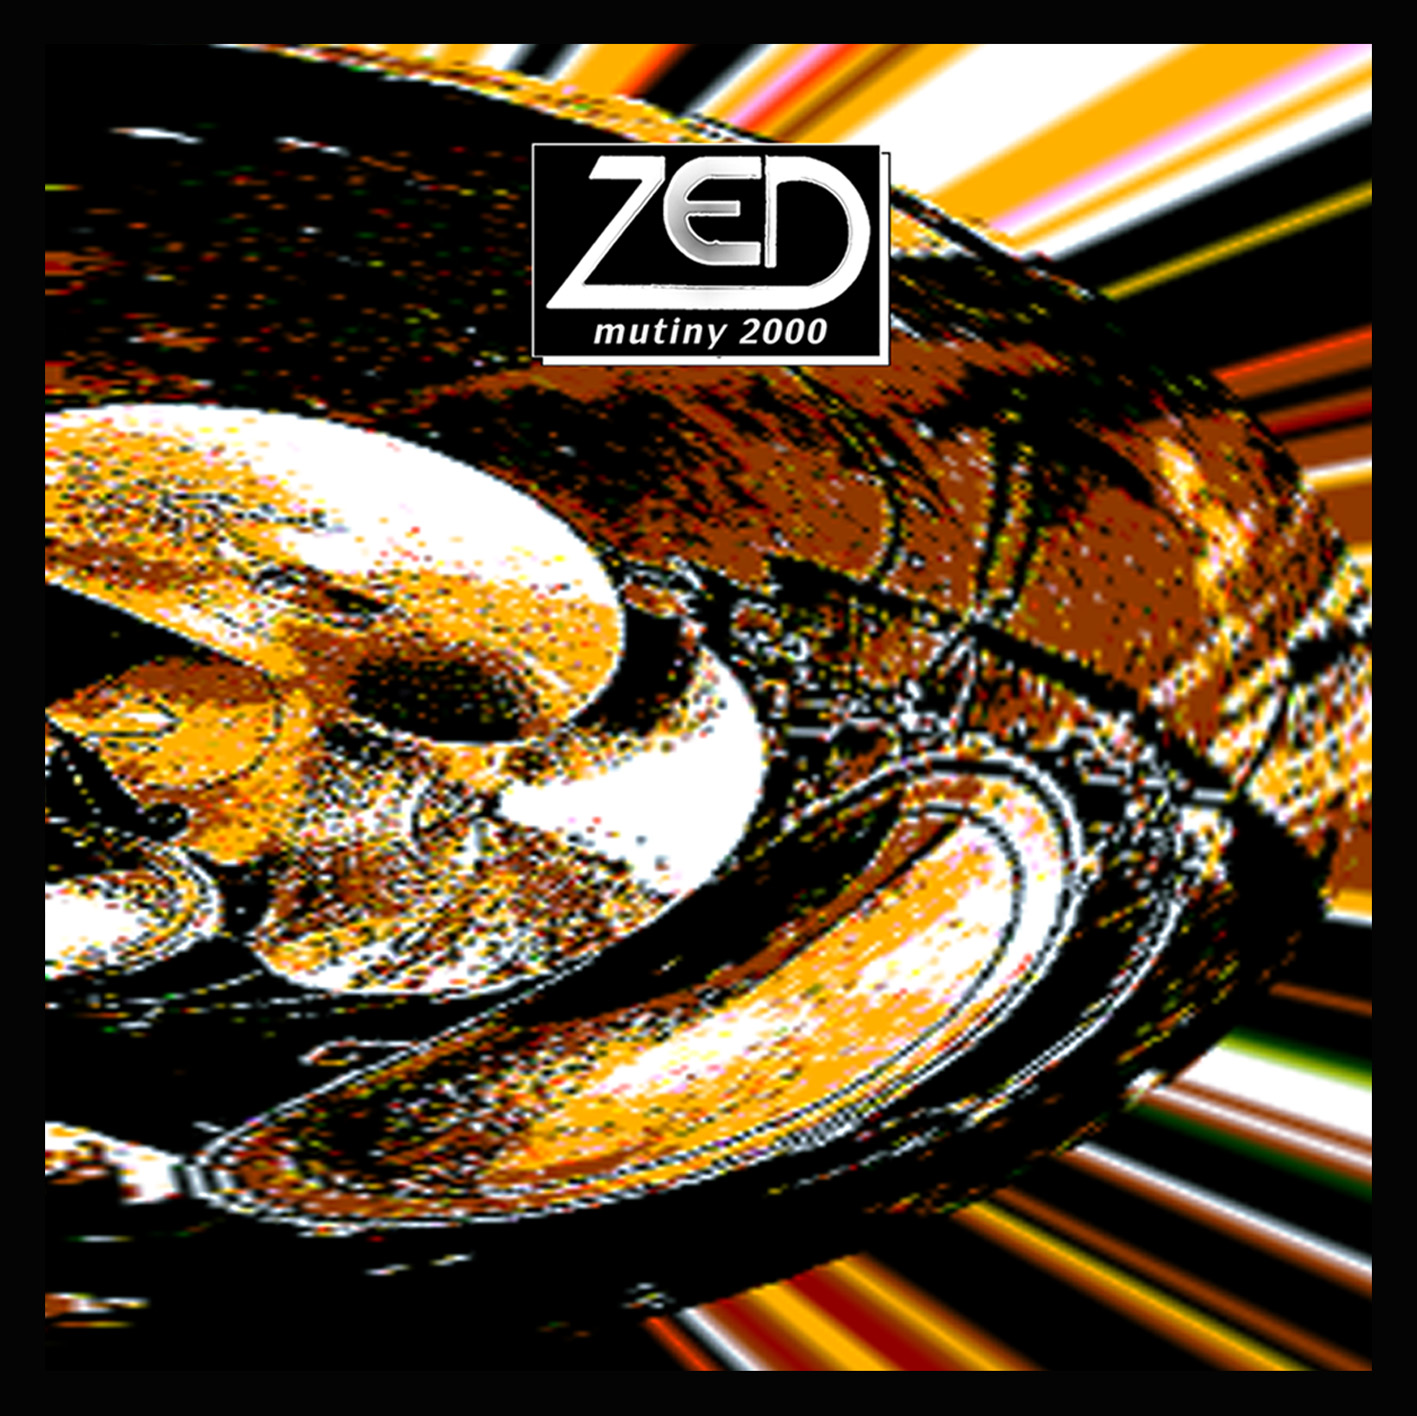 Zed - Mutiny 2000